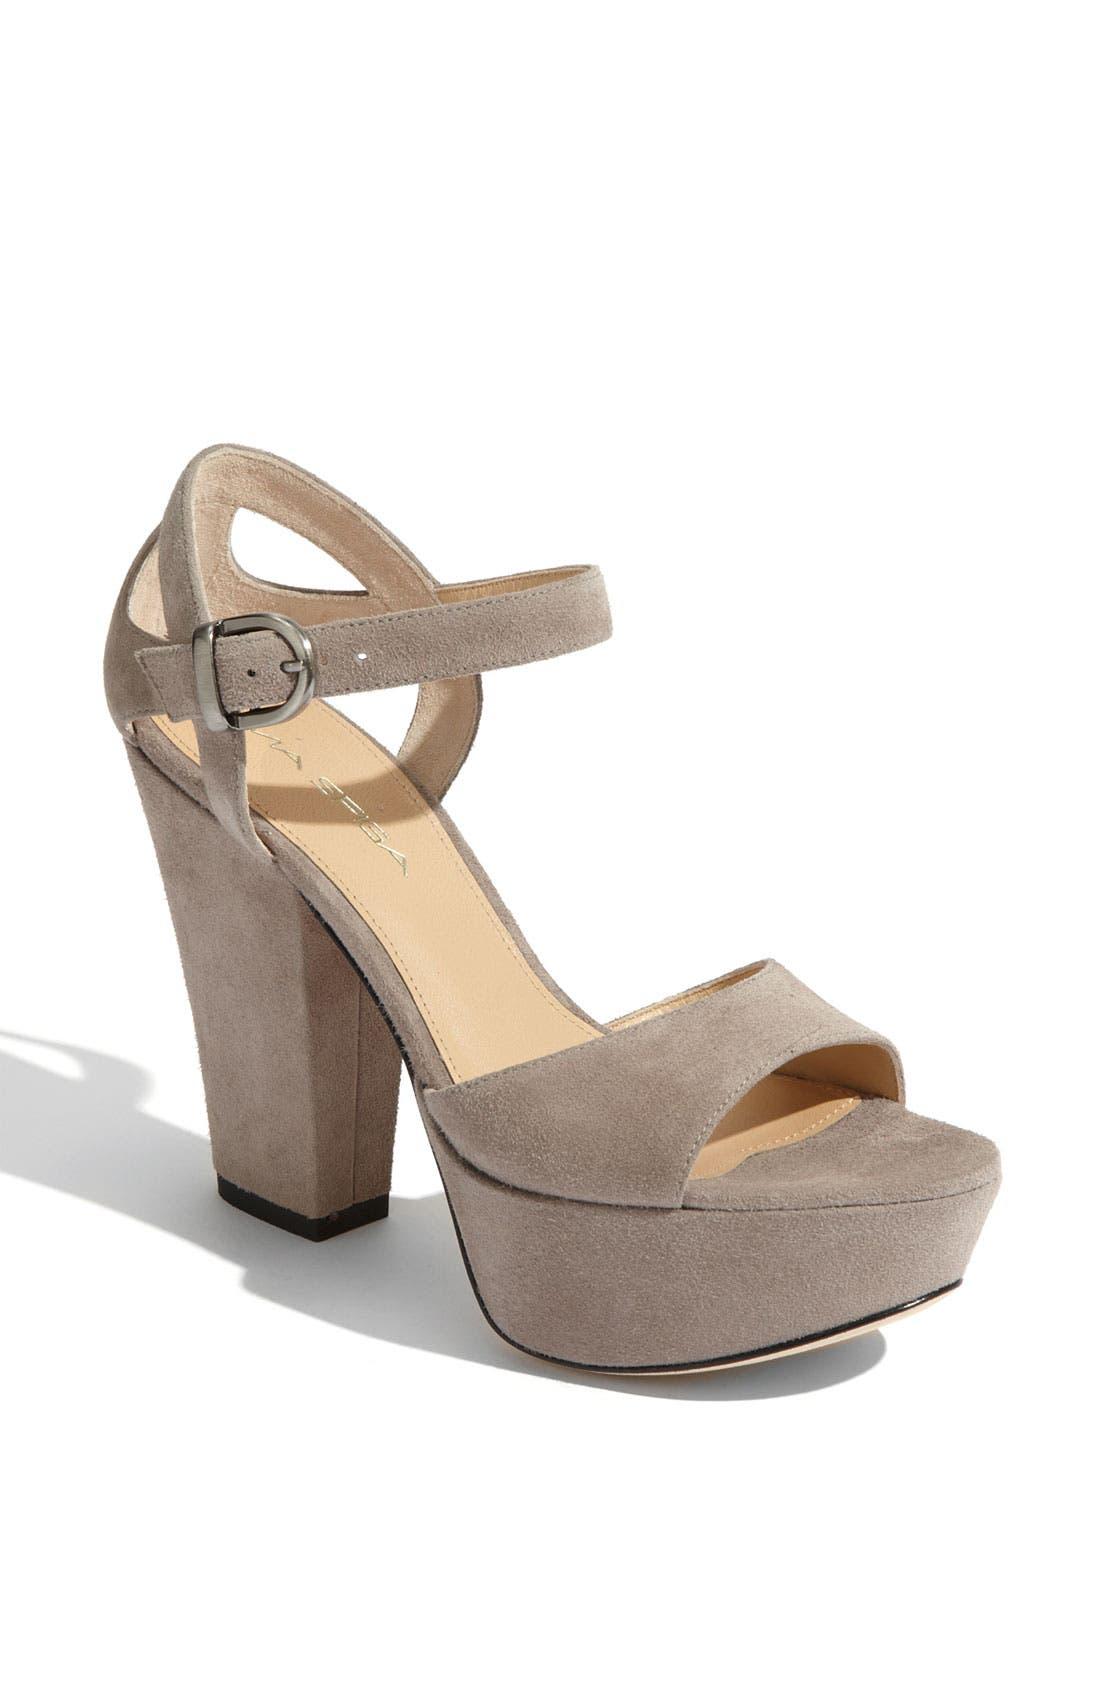 Main Image - Via Spiga 'Vanita' Sandal